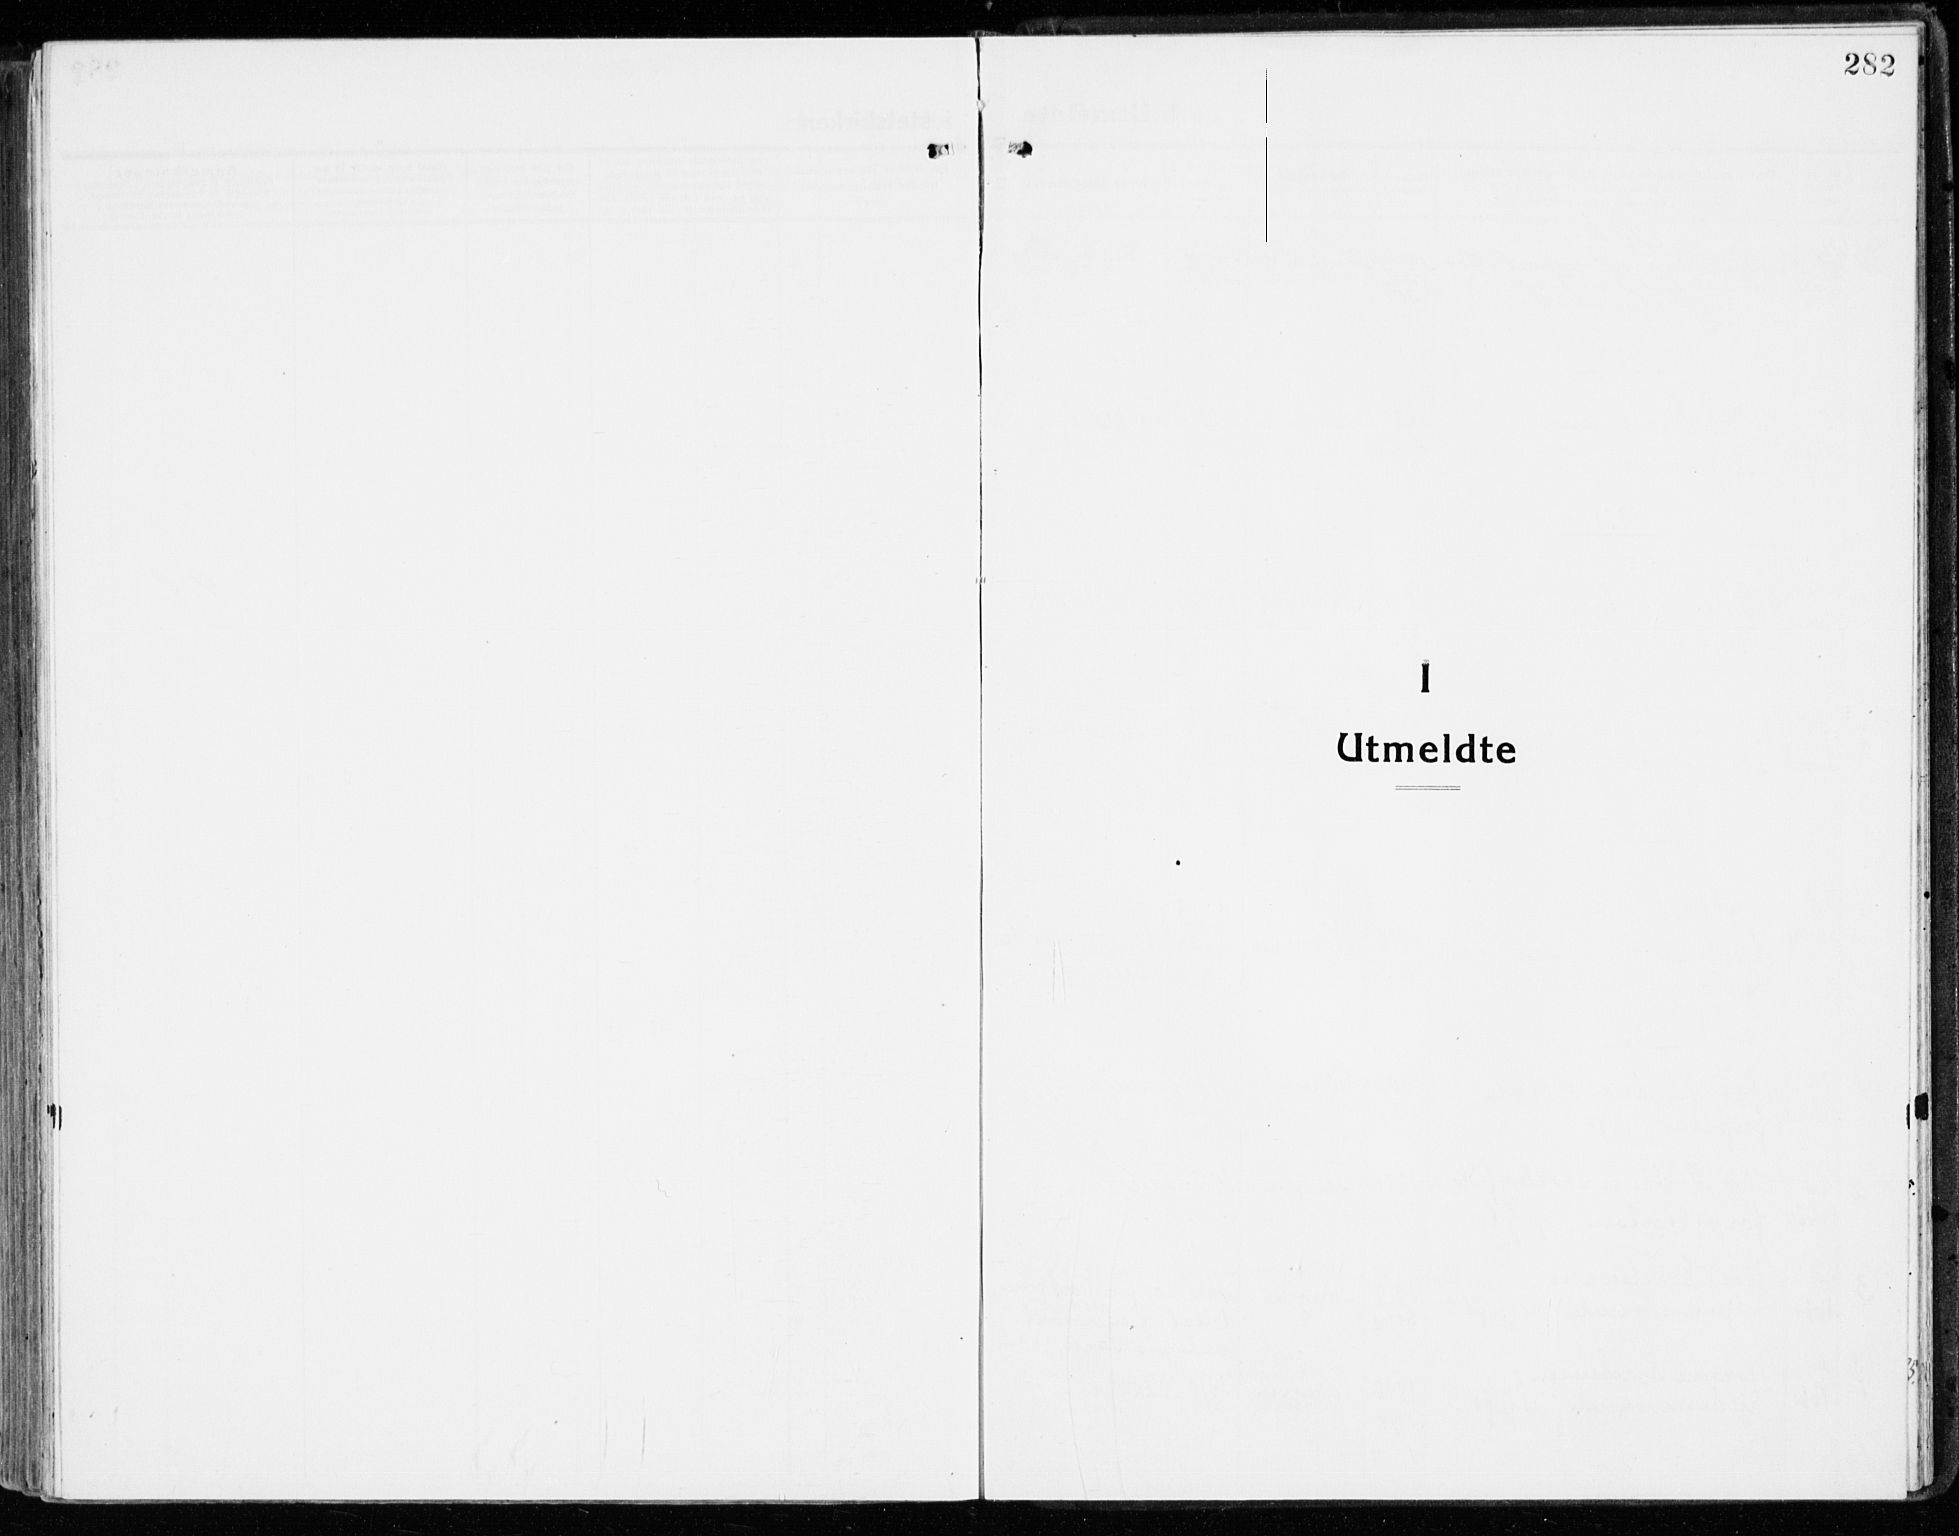 SAH, Stange prestekontor, K/L0025: Ministerialbok nr. 25, 1921-1945, s. 282